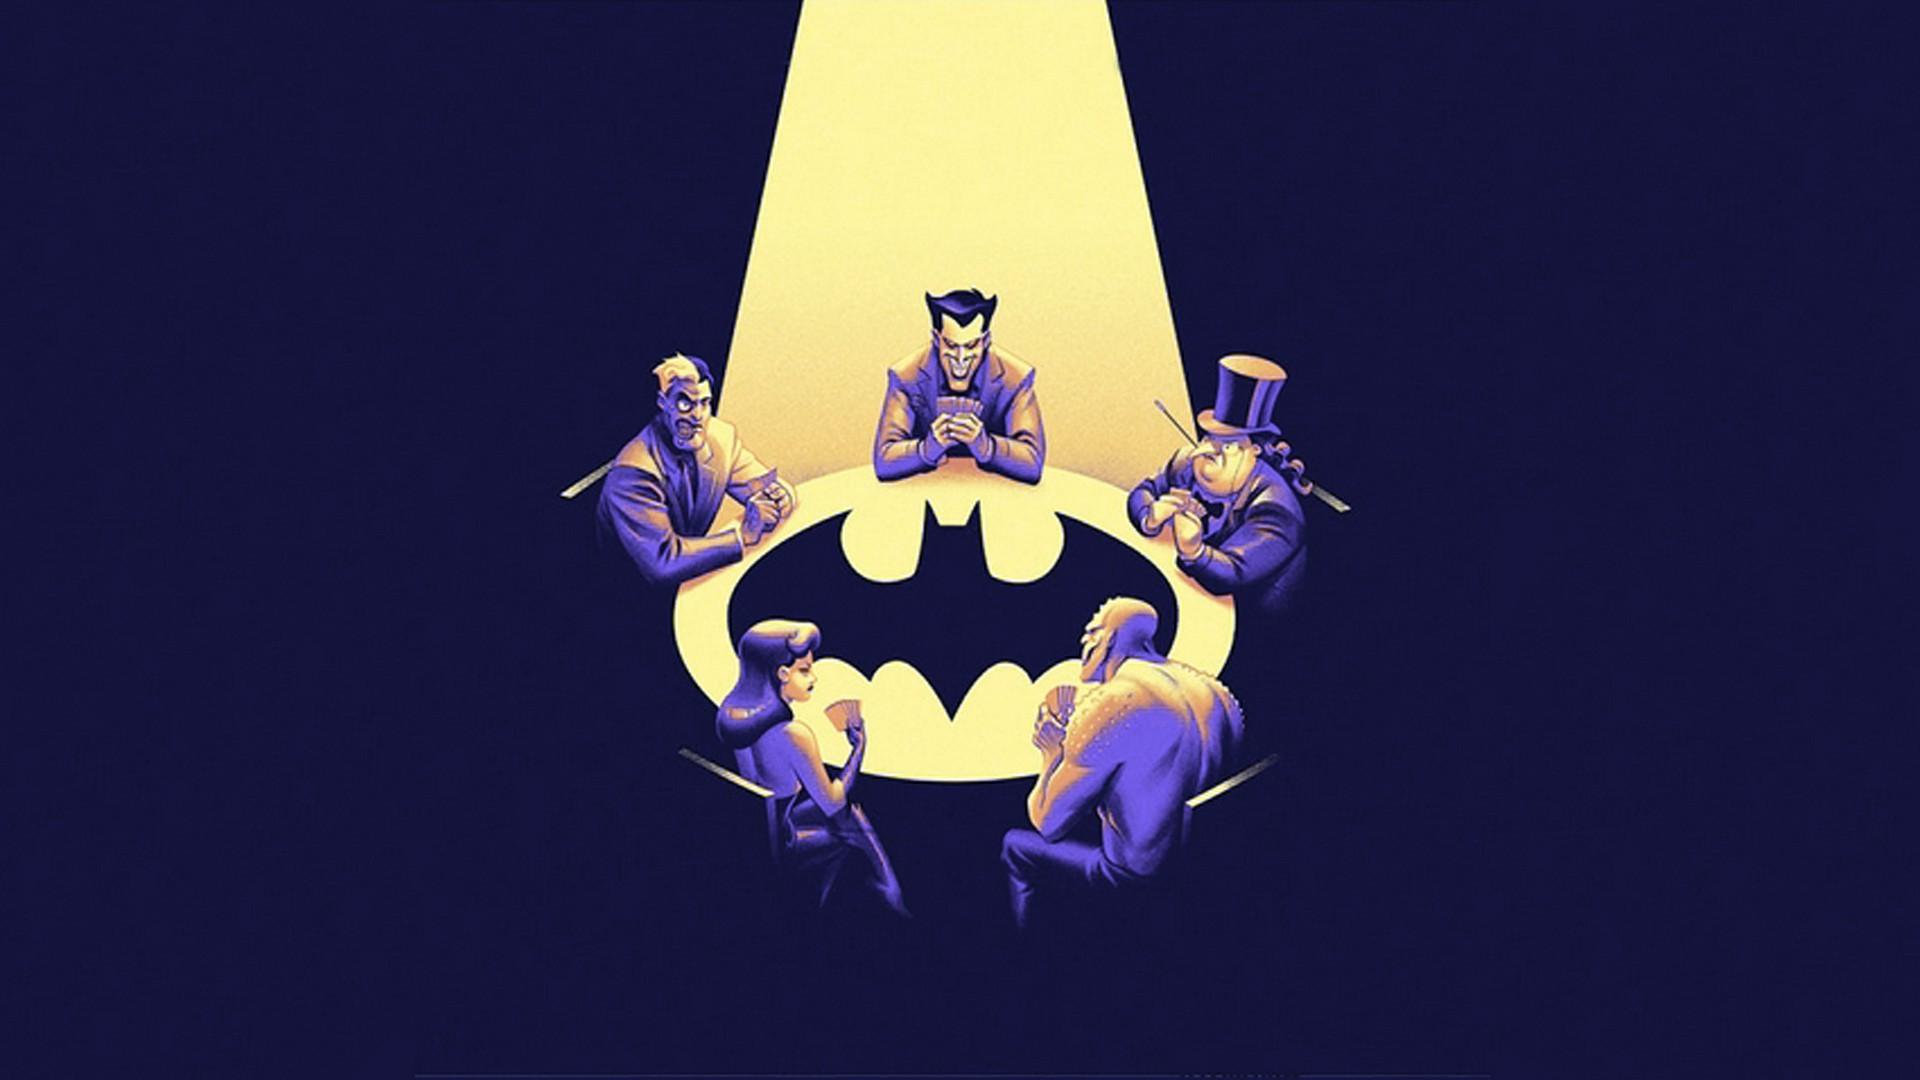 Batman Batman The Animated Series Joker Two Face 1920x1080